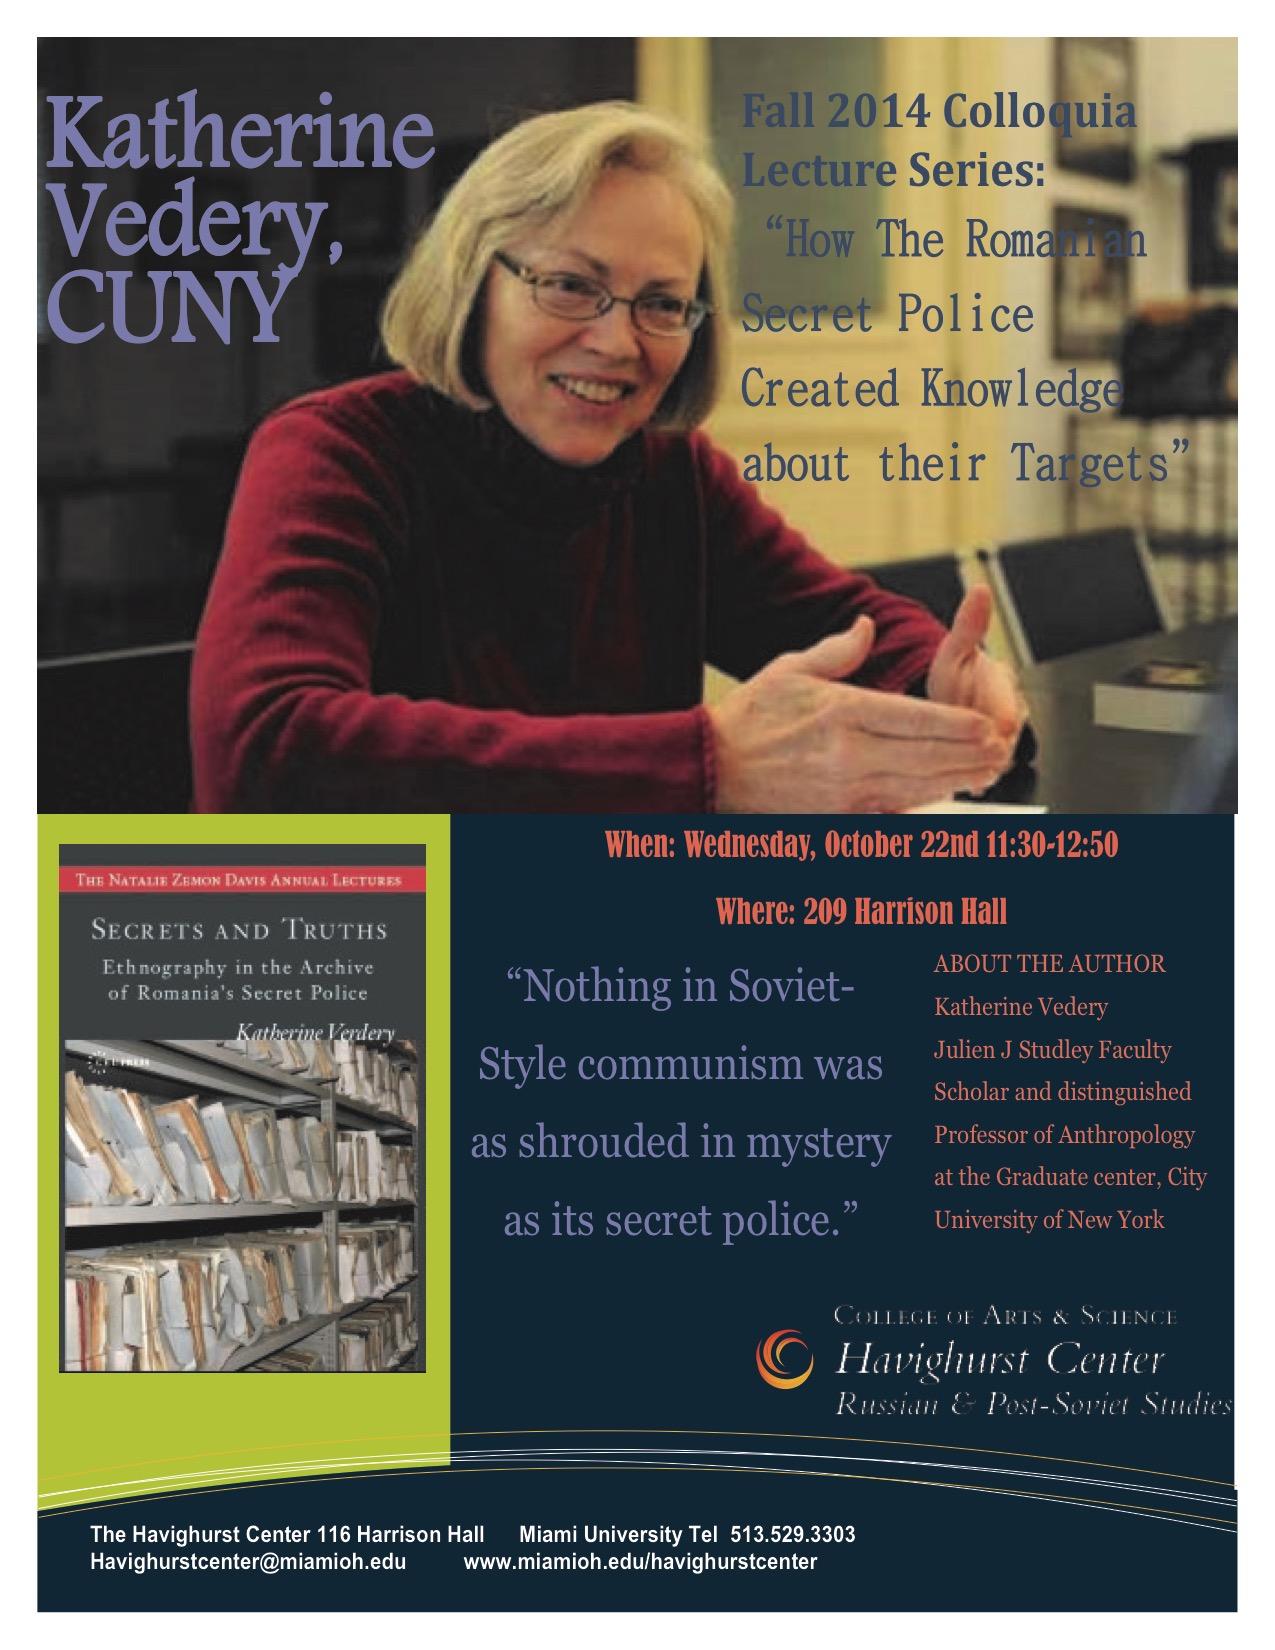 Katherine Vedery